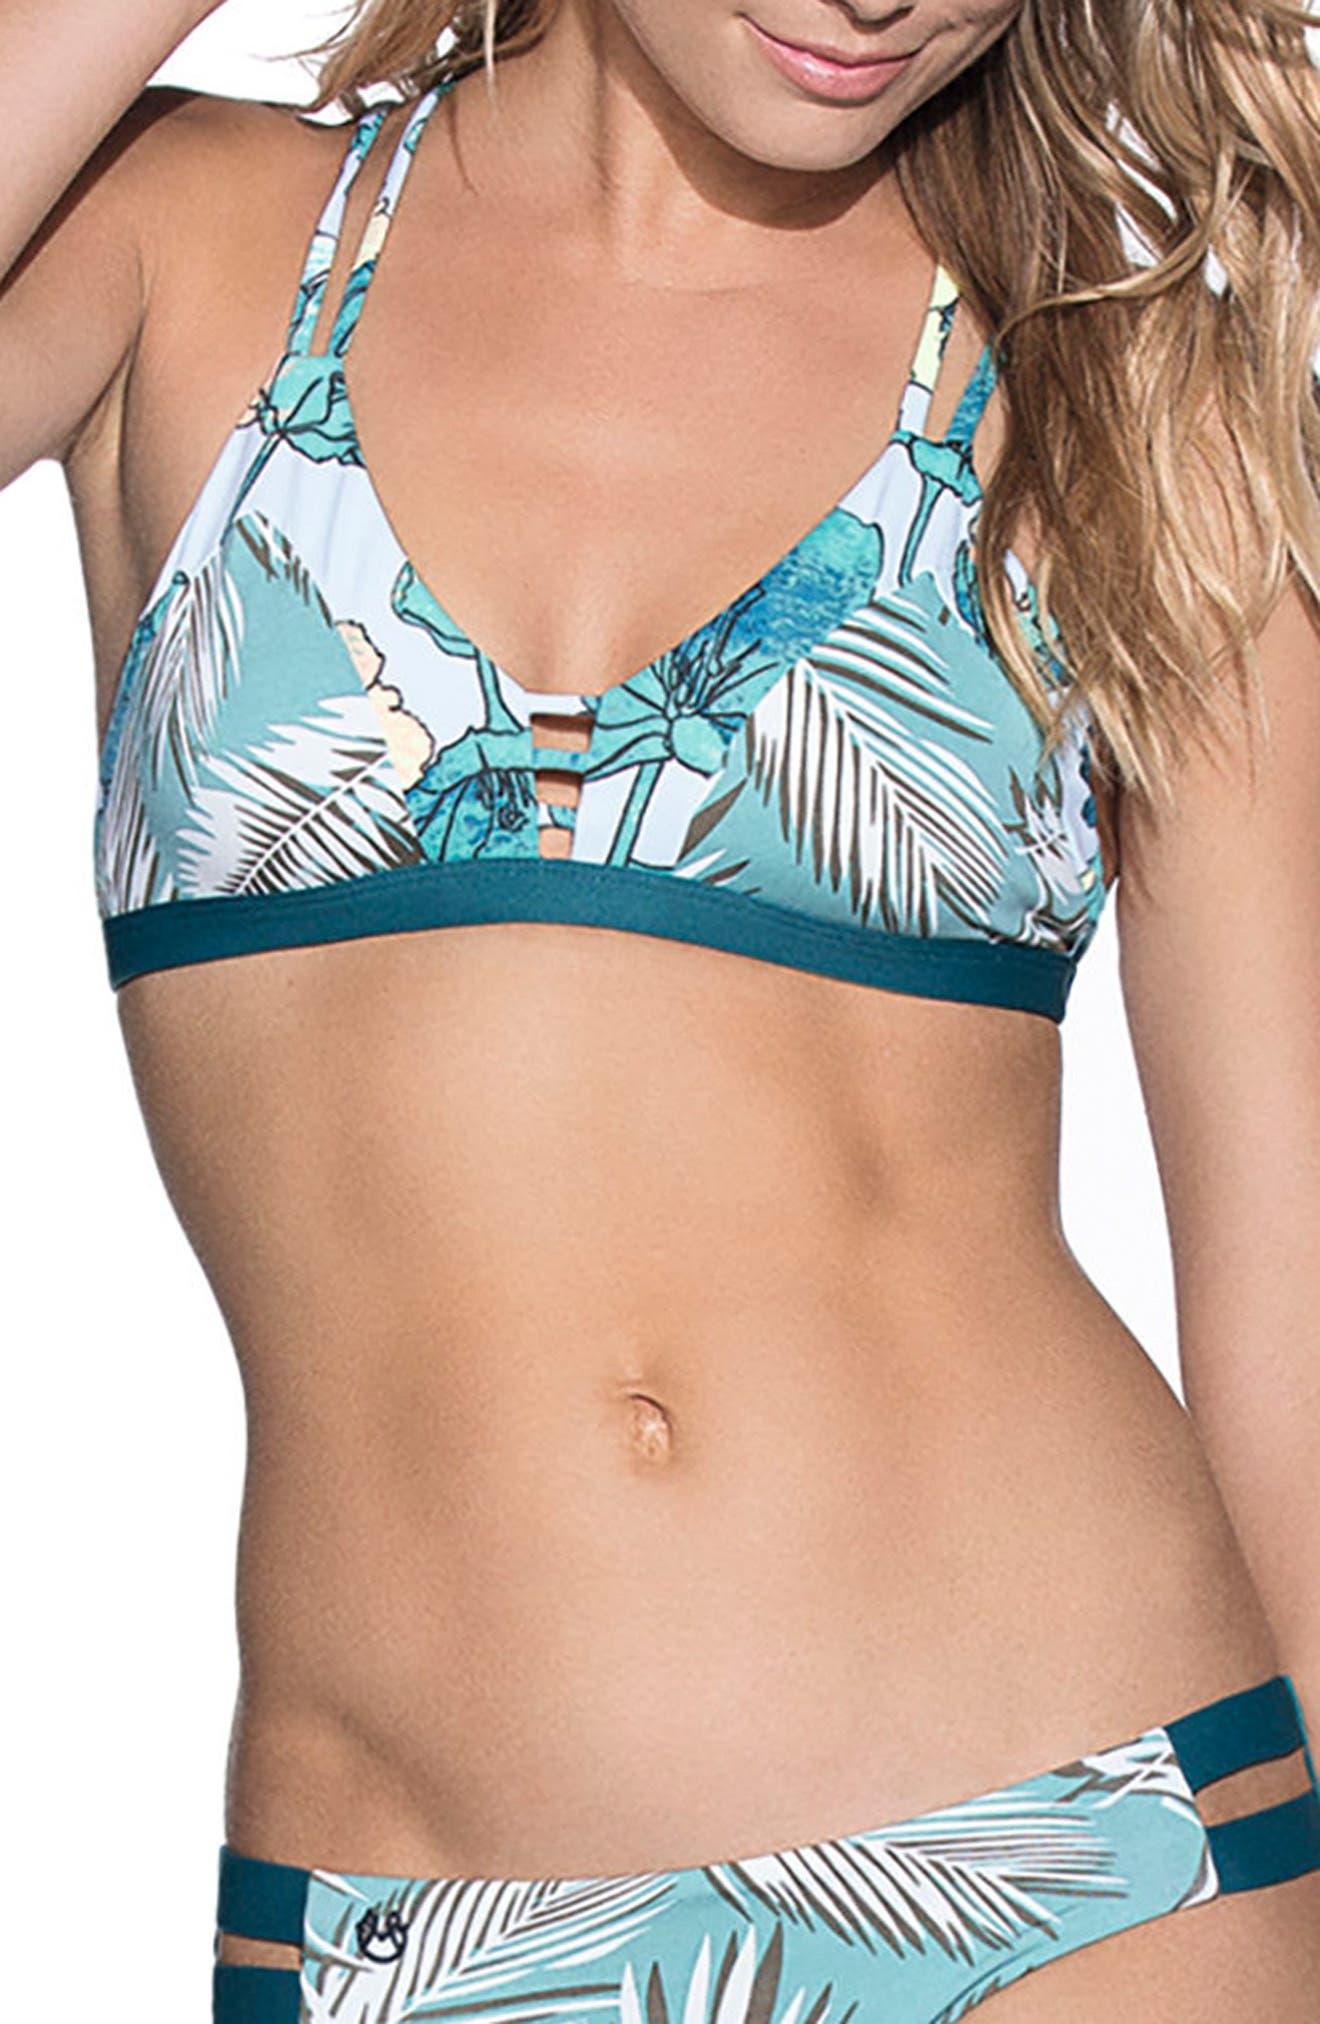 Guadua Bridge Bikini Top,                             Main thumbnail 1, color,                             Teal Multi